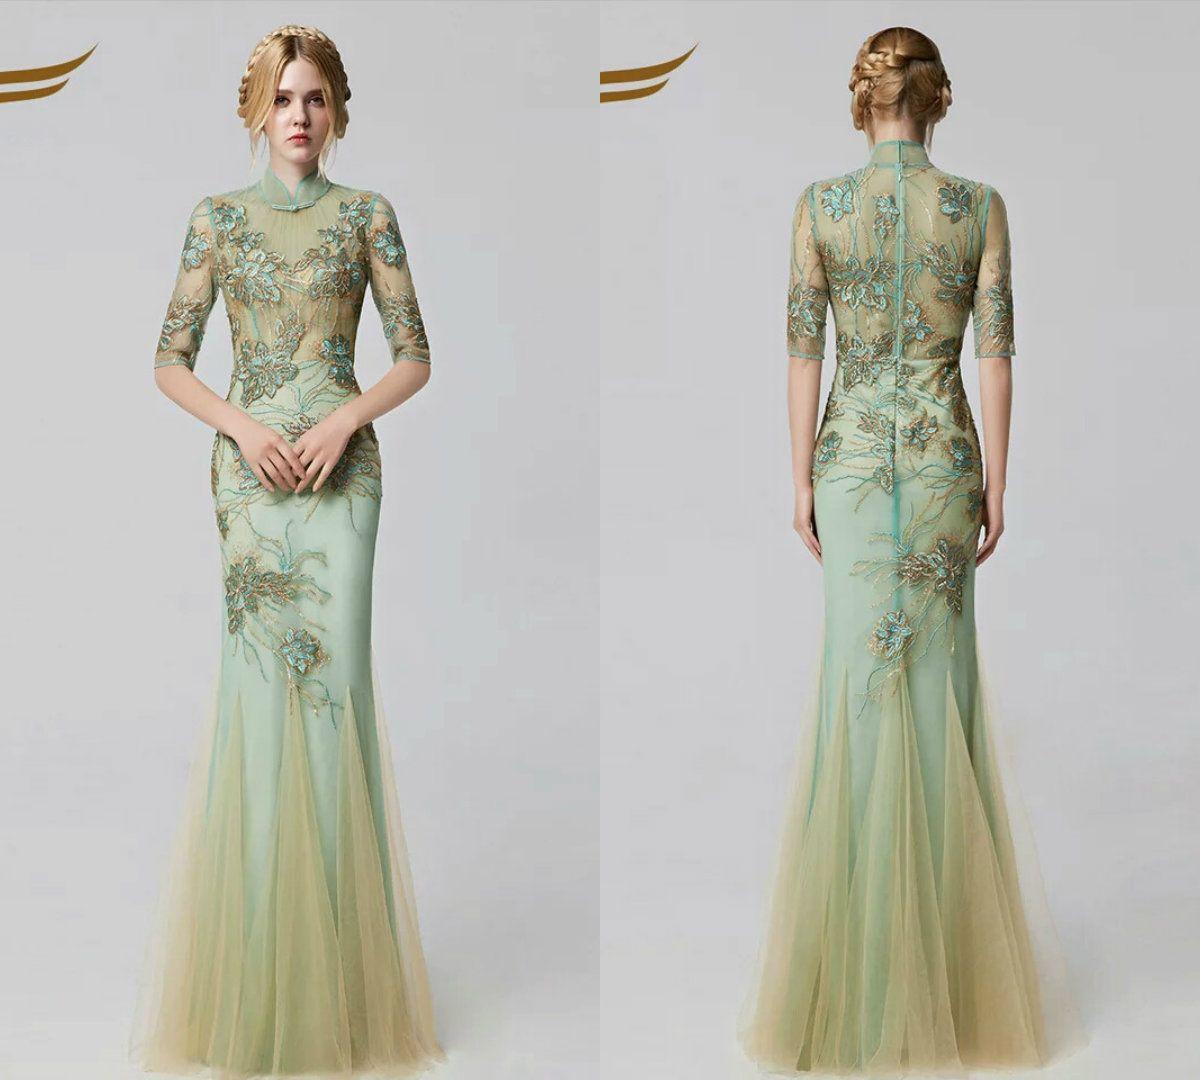 Half Long Sleeves High Neck Prom Dresses Cheongsam Lace Applique ...